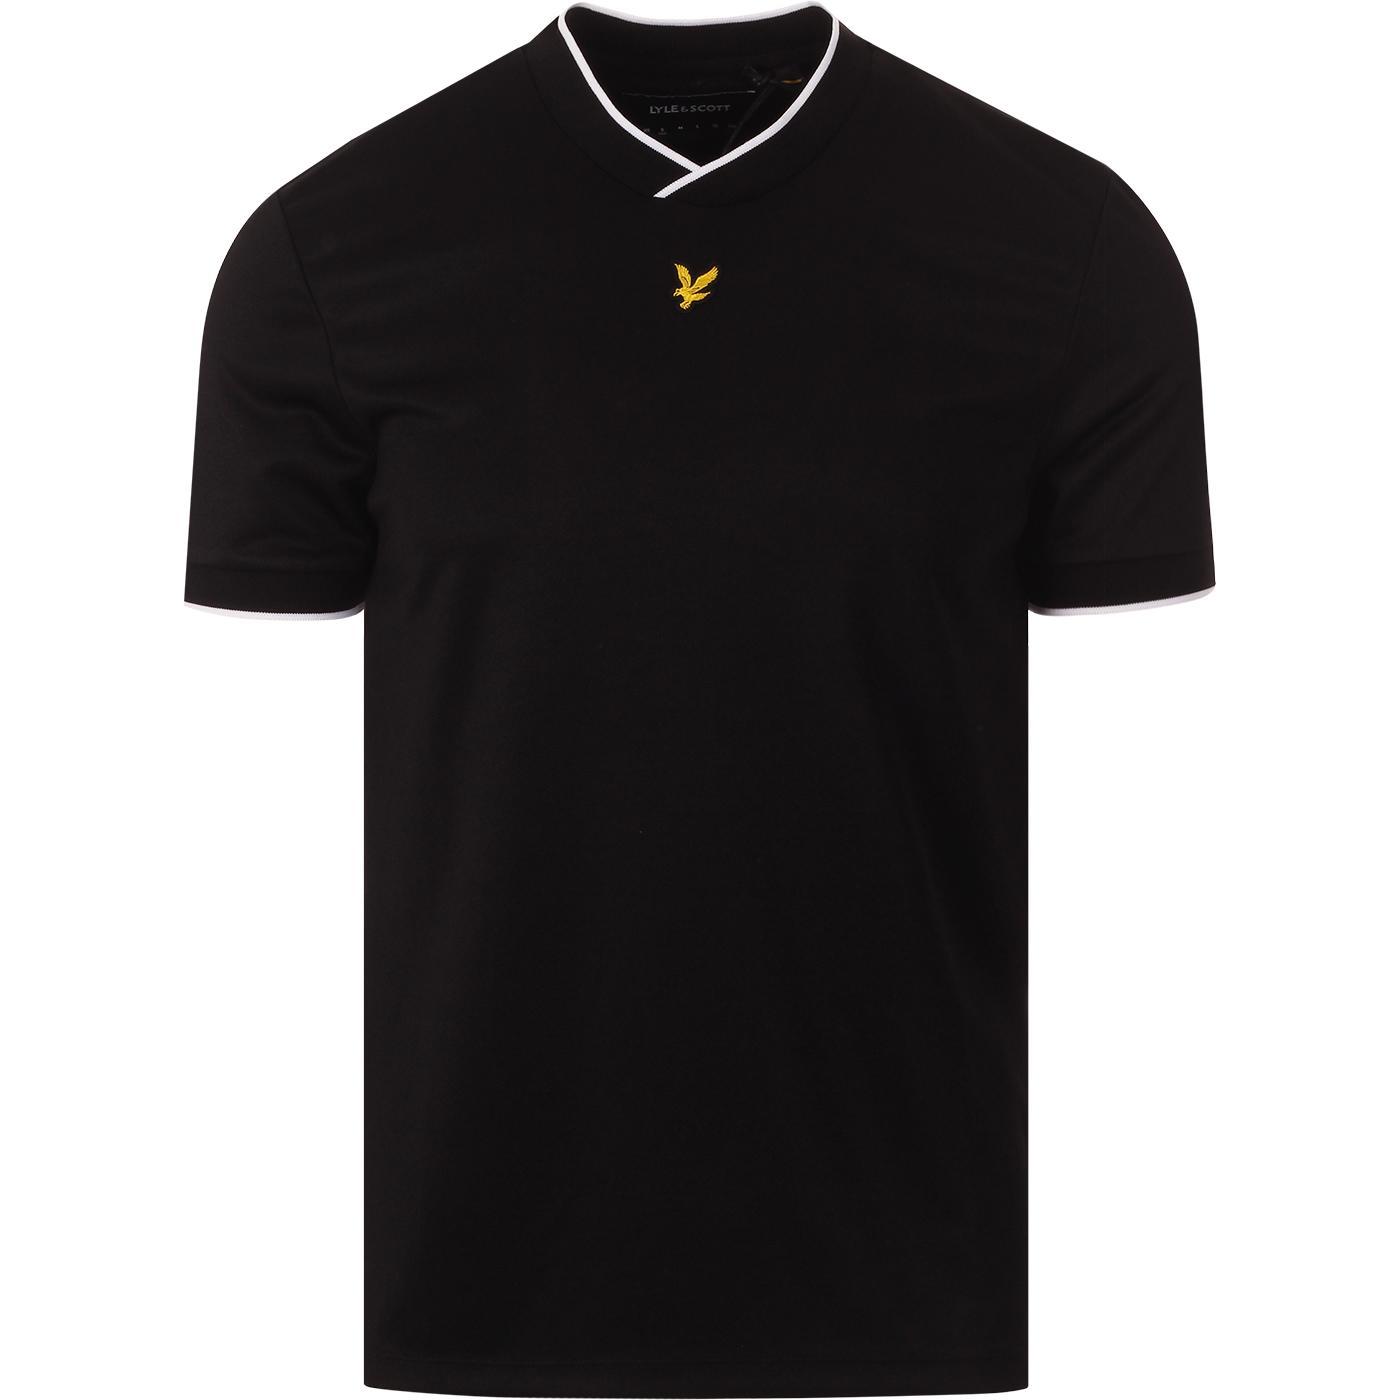 LYLE & SCOTT Men's Retro Football Jersey T-Shirt B